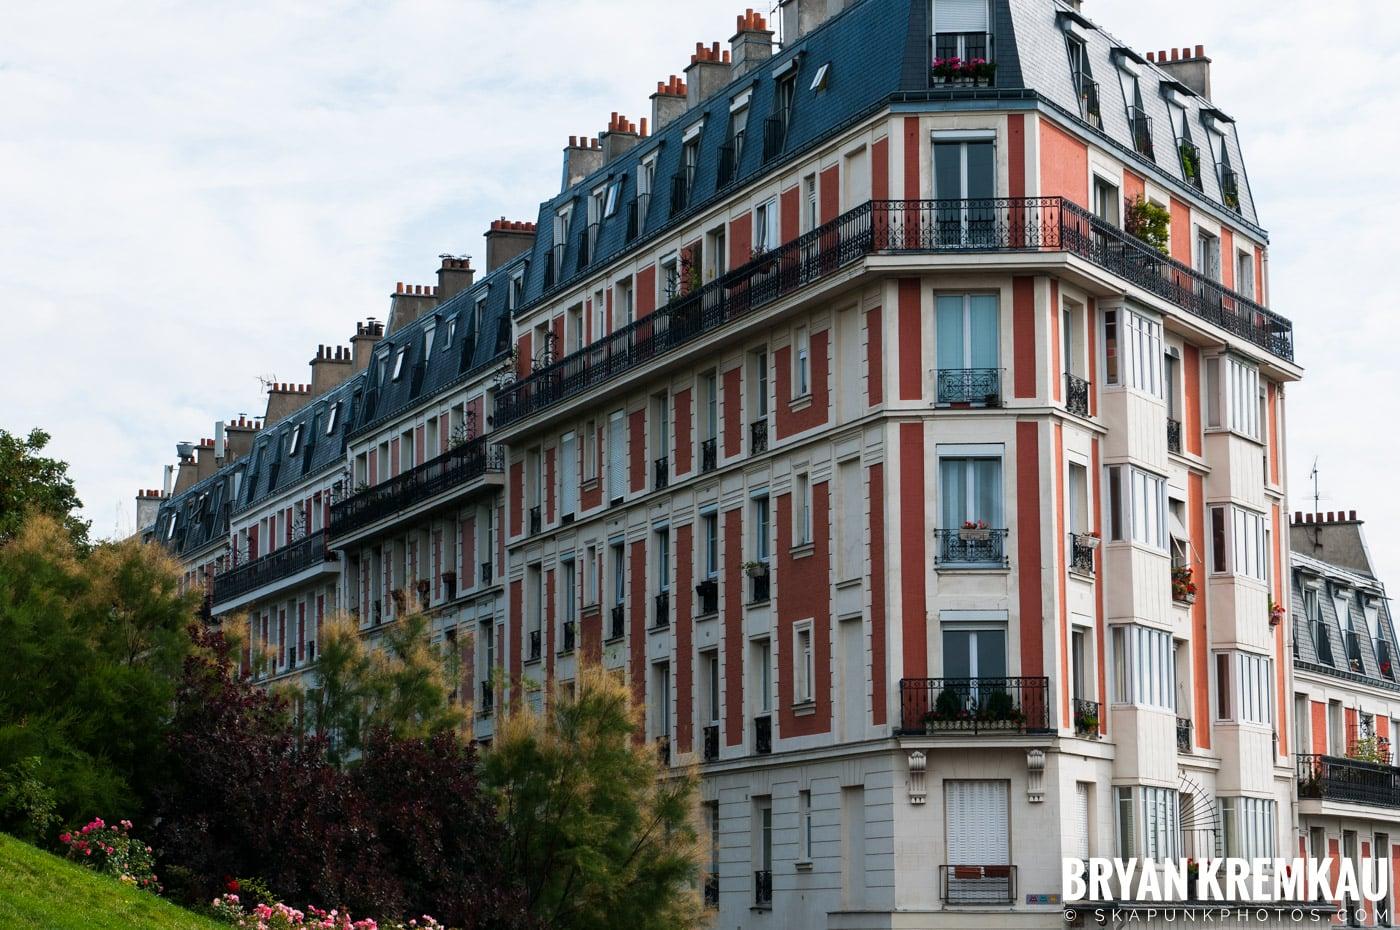 Paris, France Honeymoon - Day 6 - 7.23.11 (55)